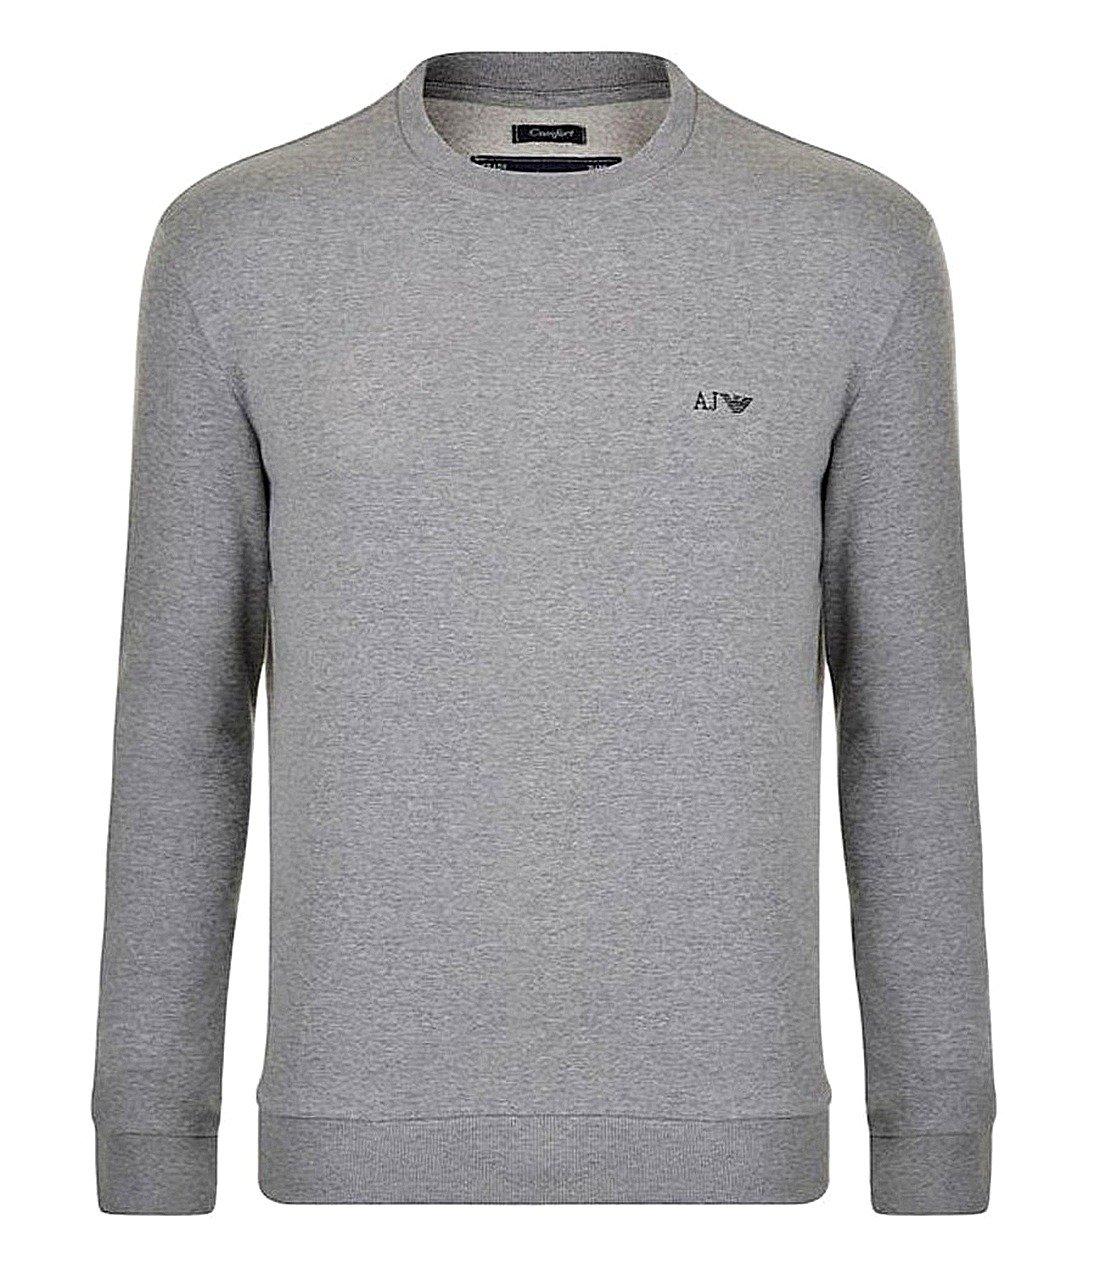 huge discount ed8ef be4df ARMANI JEANS Herren Men Sweatshirt Pullover Sweater Grau Grey Logo